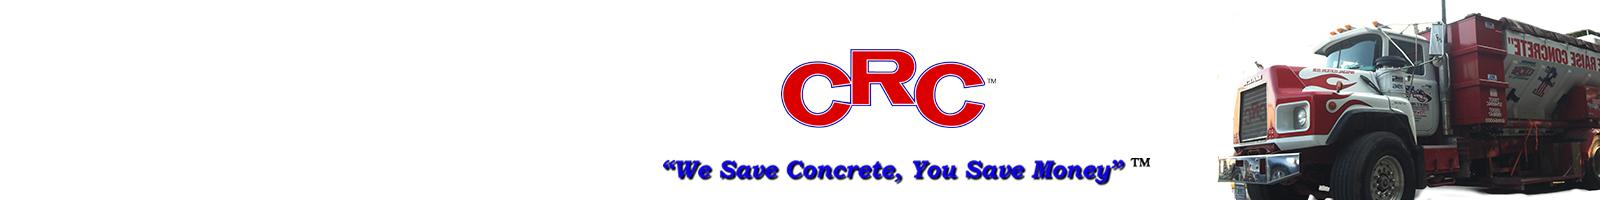 CRC | Concrete Raising Corporation